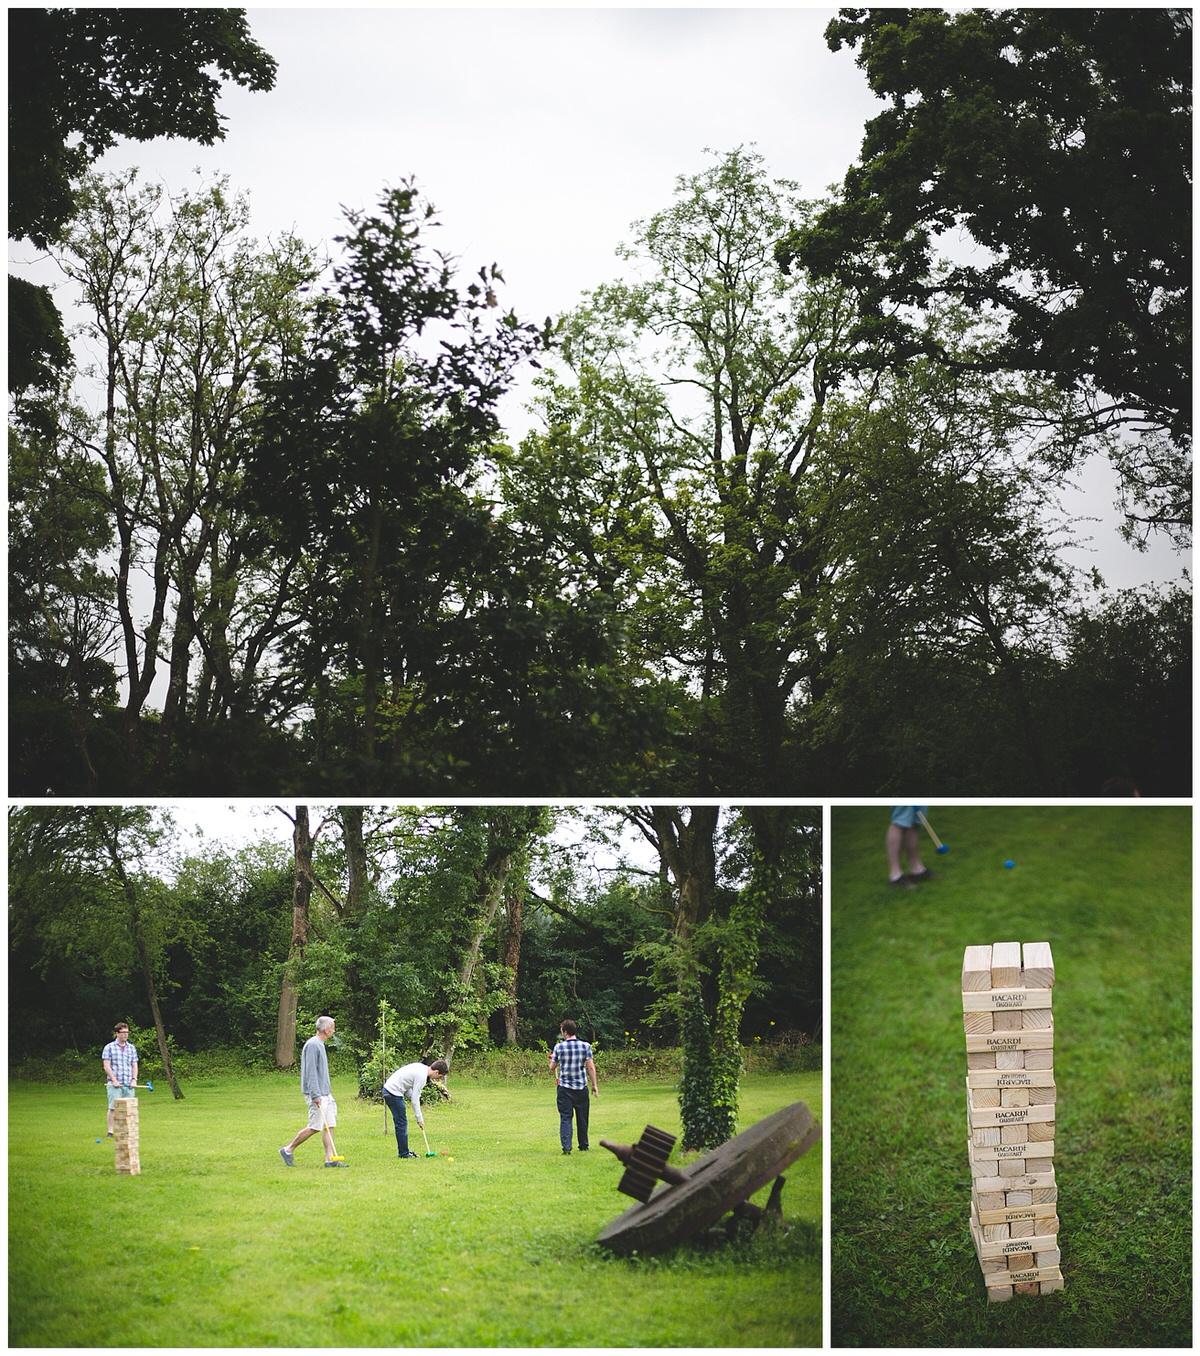 Day 2 wedding lawn games - Jenga